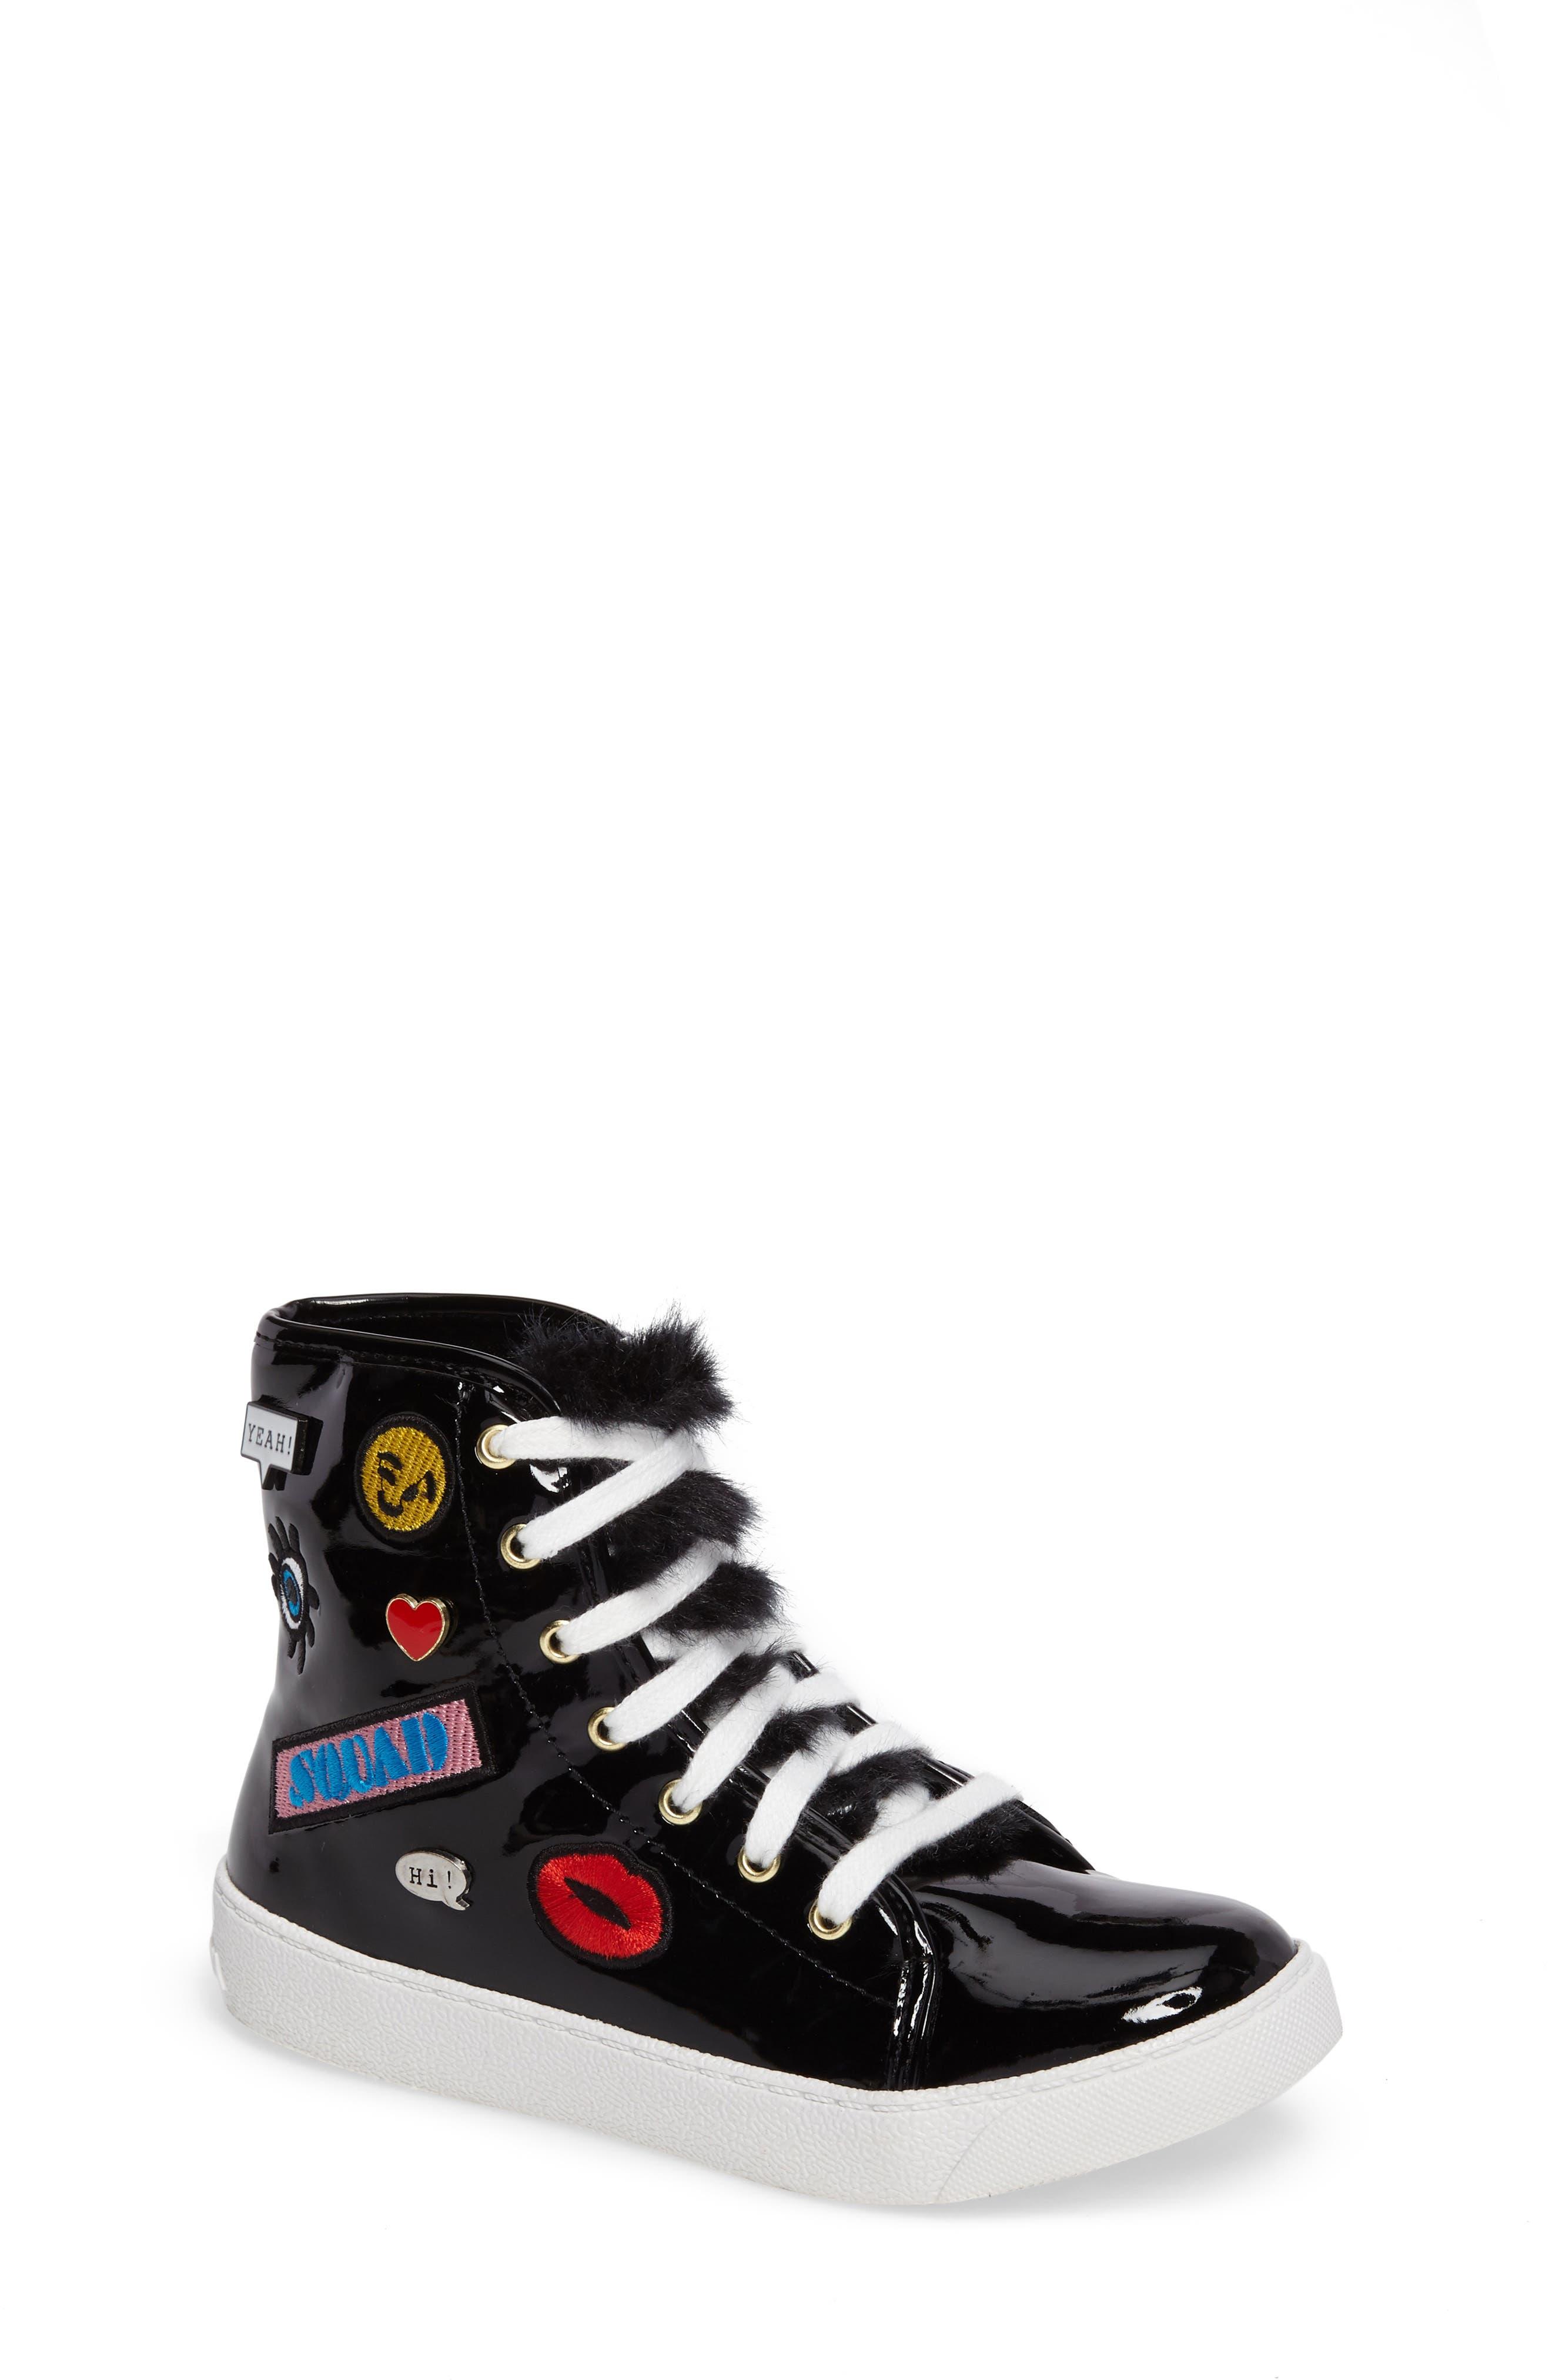 Harriet Heidi High-Top Sneaker,                             Main thumbnail 1, color,                             001